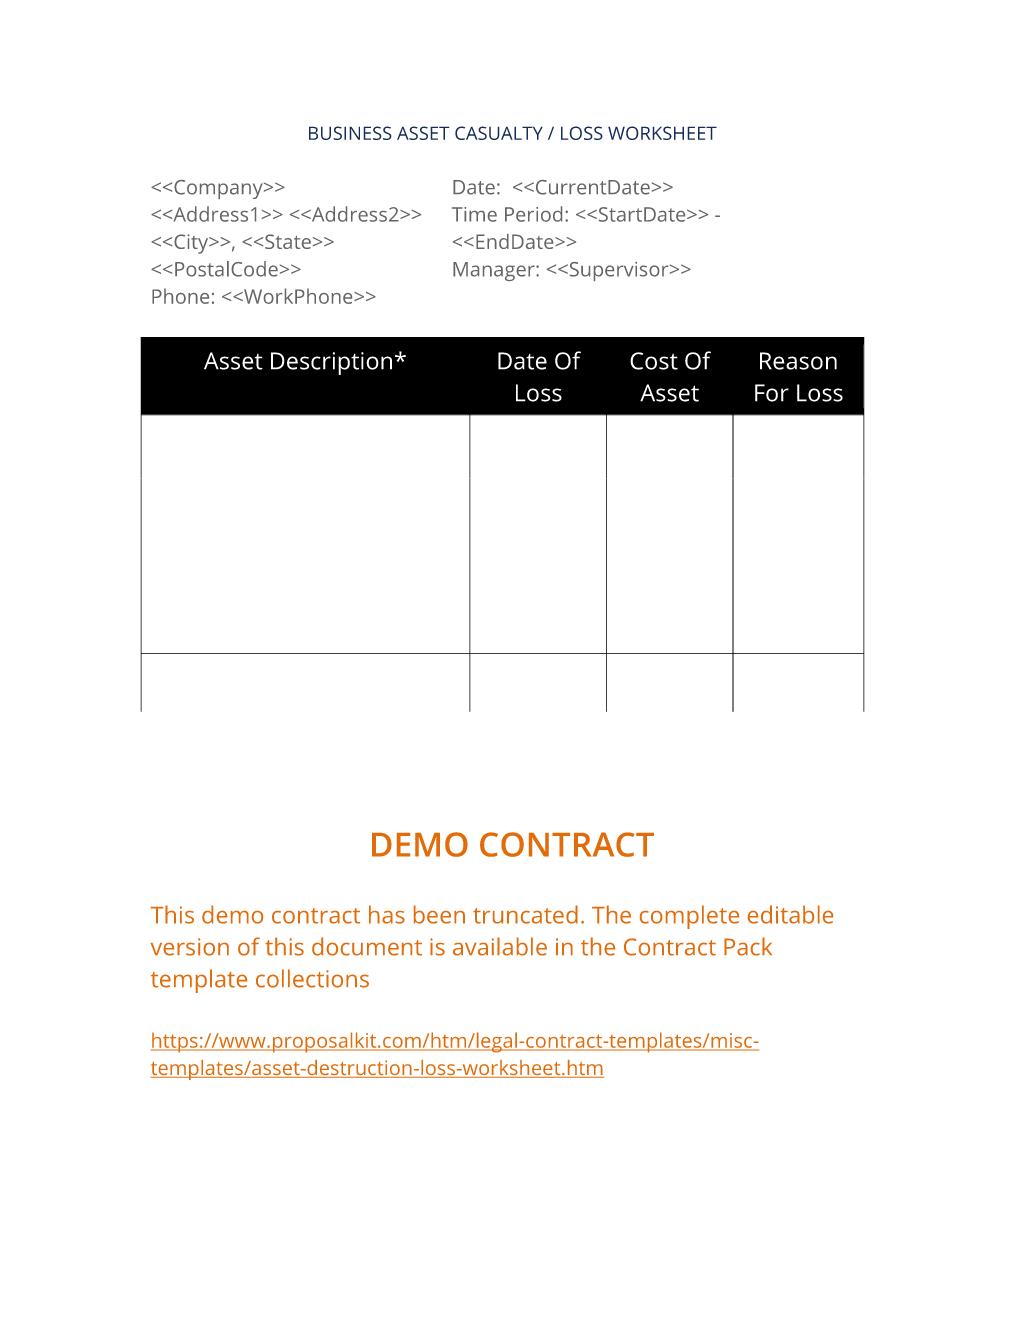 Asset Destruction Loss Worksheet